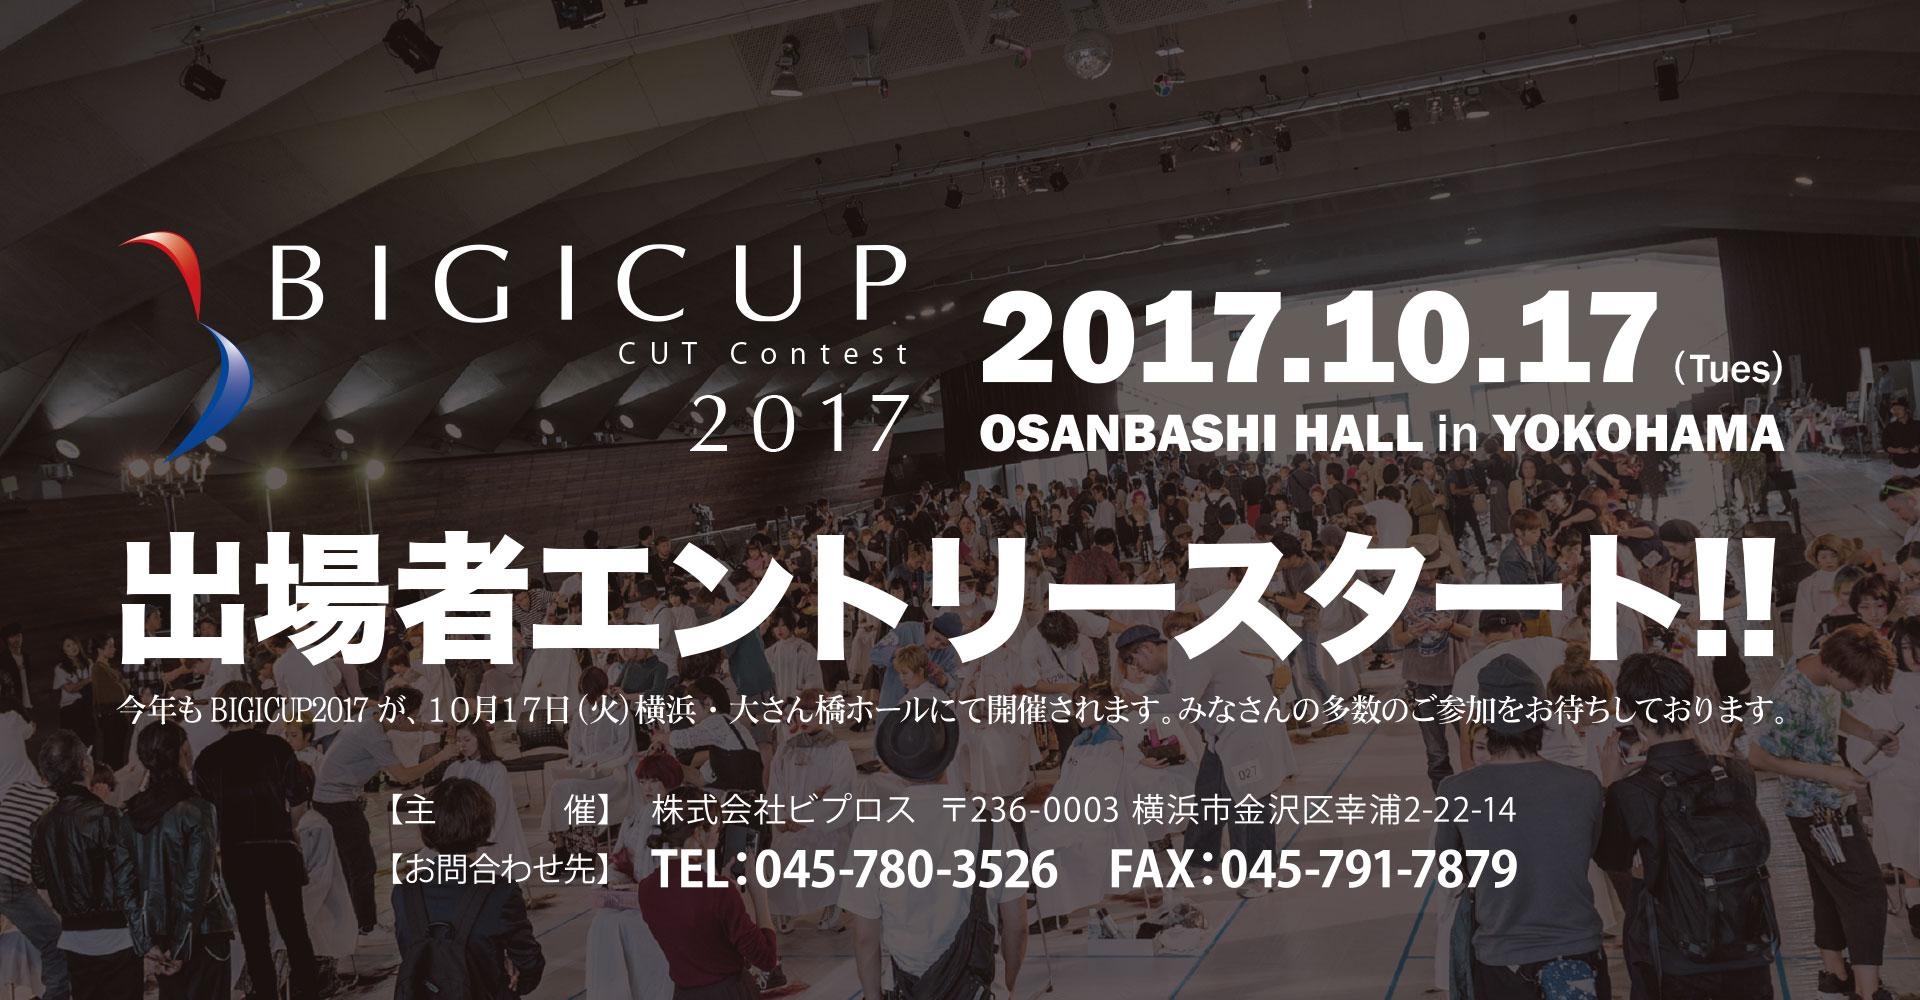 IGICUP2017